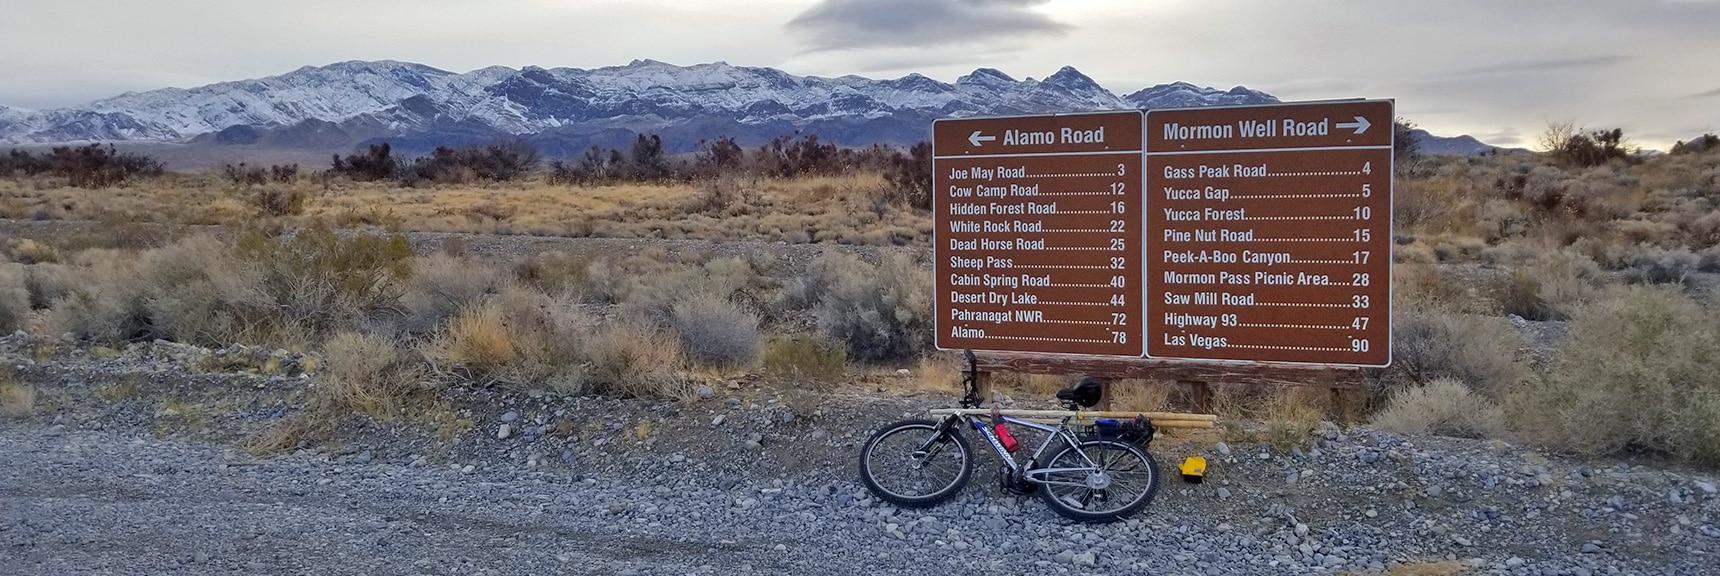 Adventure Begins on Alamo Road. Points of Interest on Sign.   Cow Camp Road   Sheep Range   Desert National Wildlife Refuge, Nevada